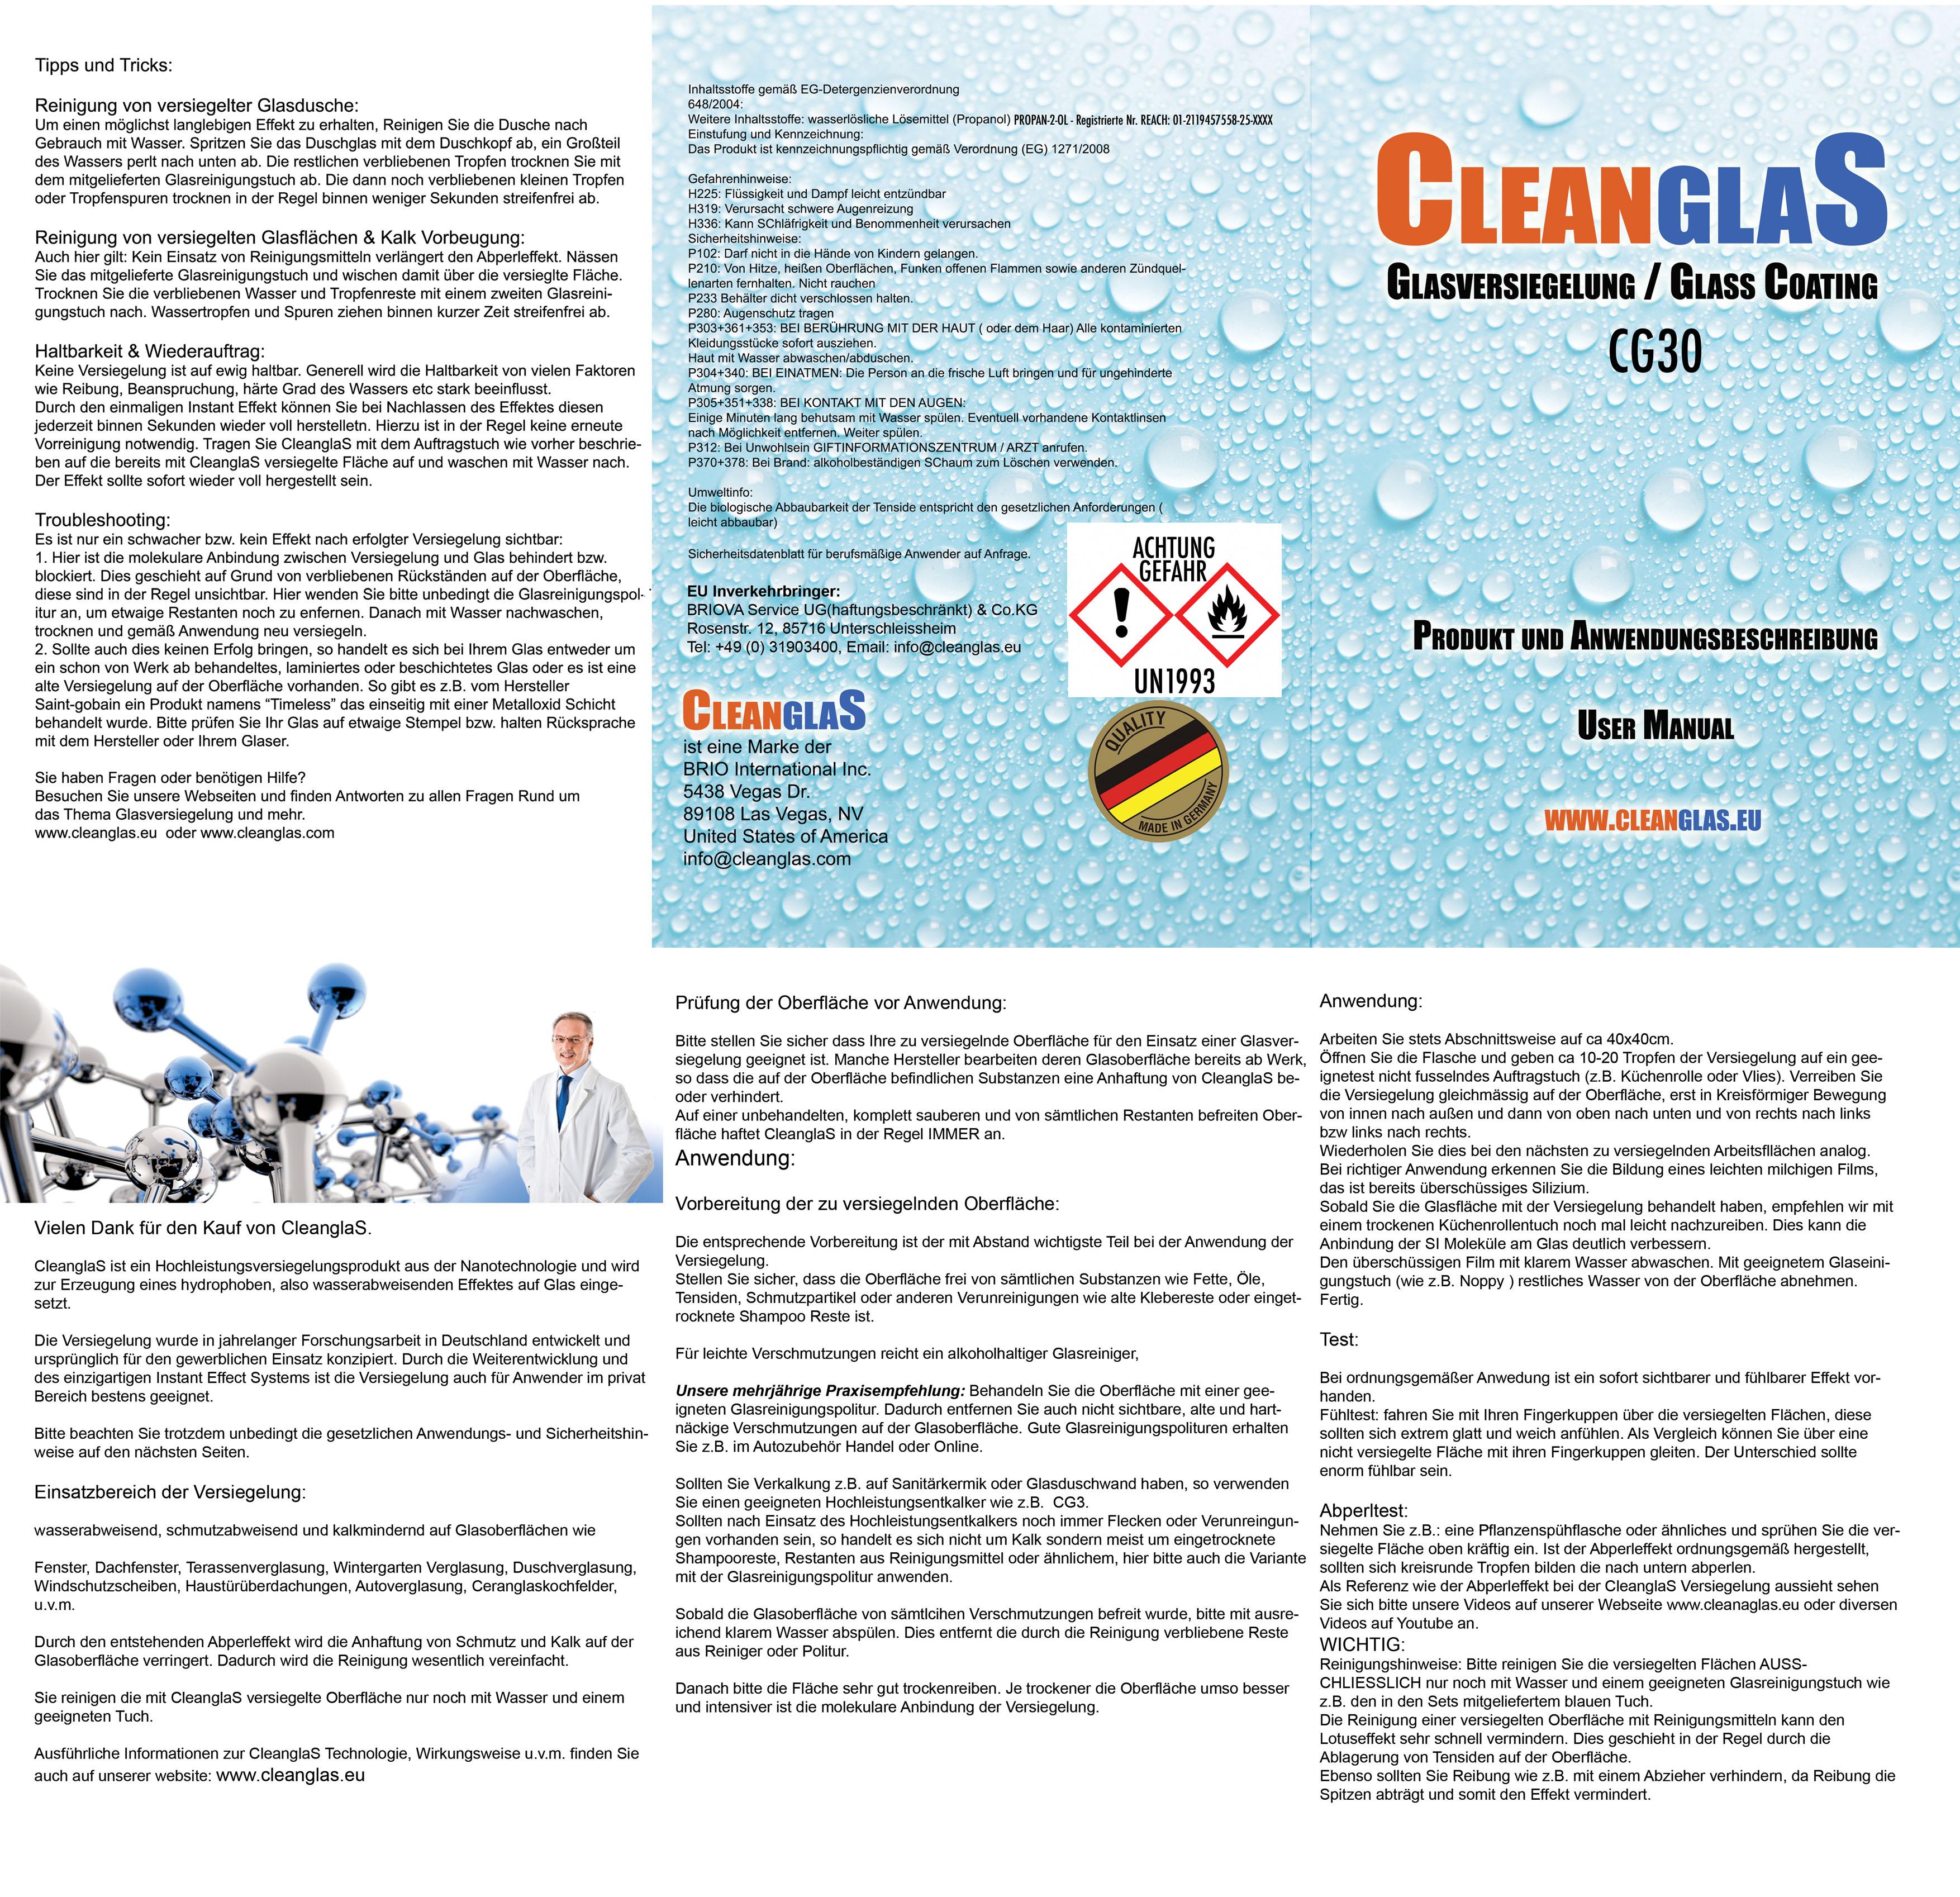 Anleitung_Clanglas_Glasversiegelung_D_1seitig_04_2020